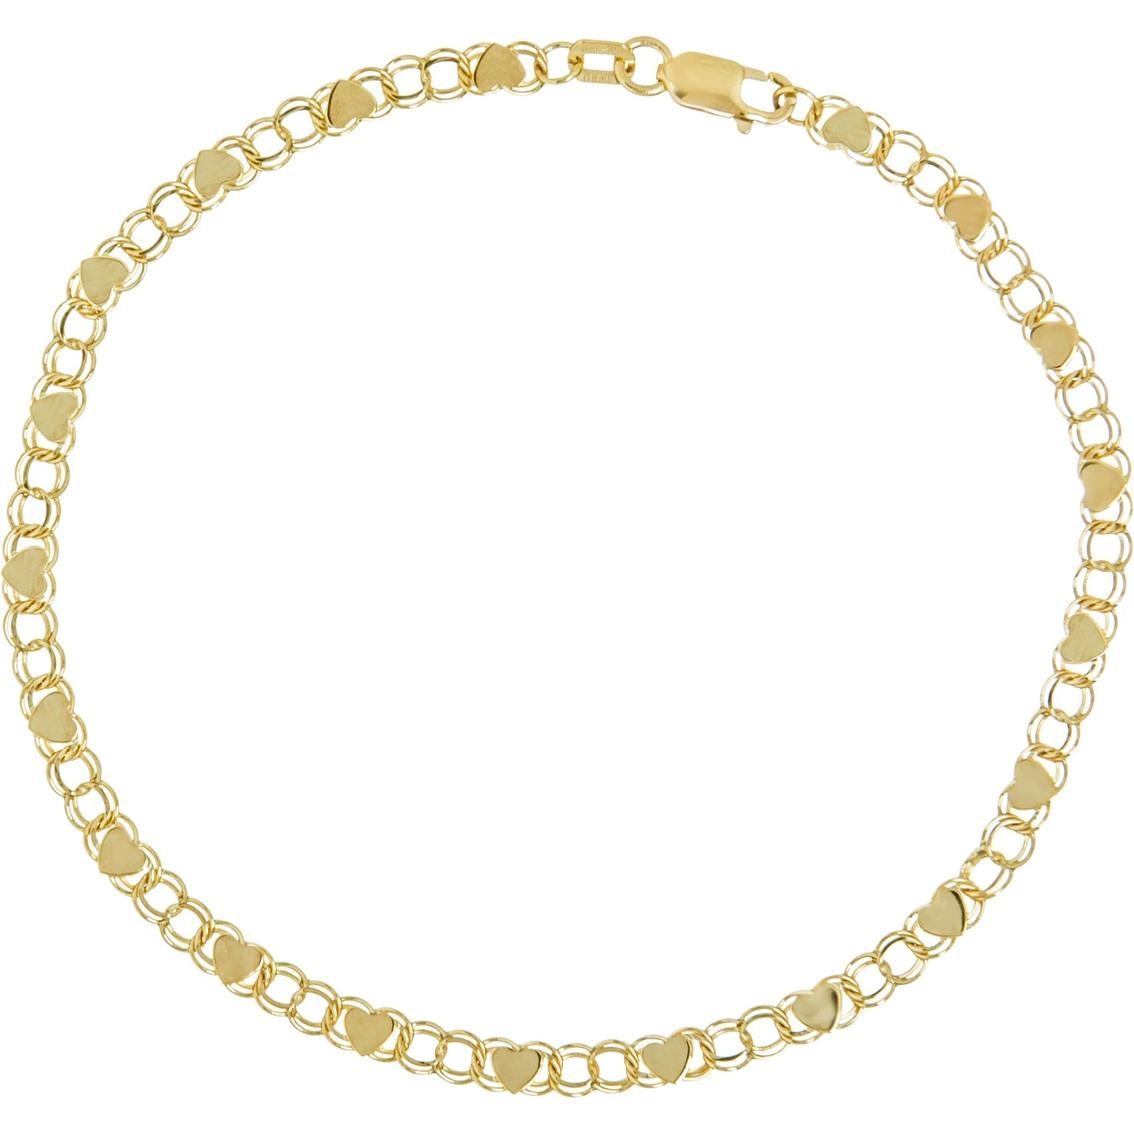 14K Yellow Gold Heart Mirror Rope Bracelet | Gold Bracelets Intended For Gold Heart Mirror (Image 1 of 20)